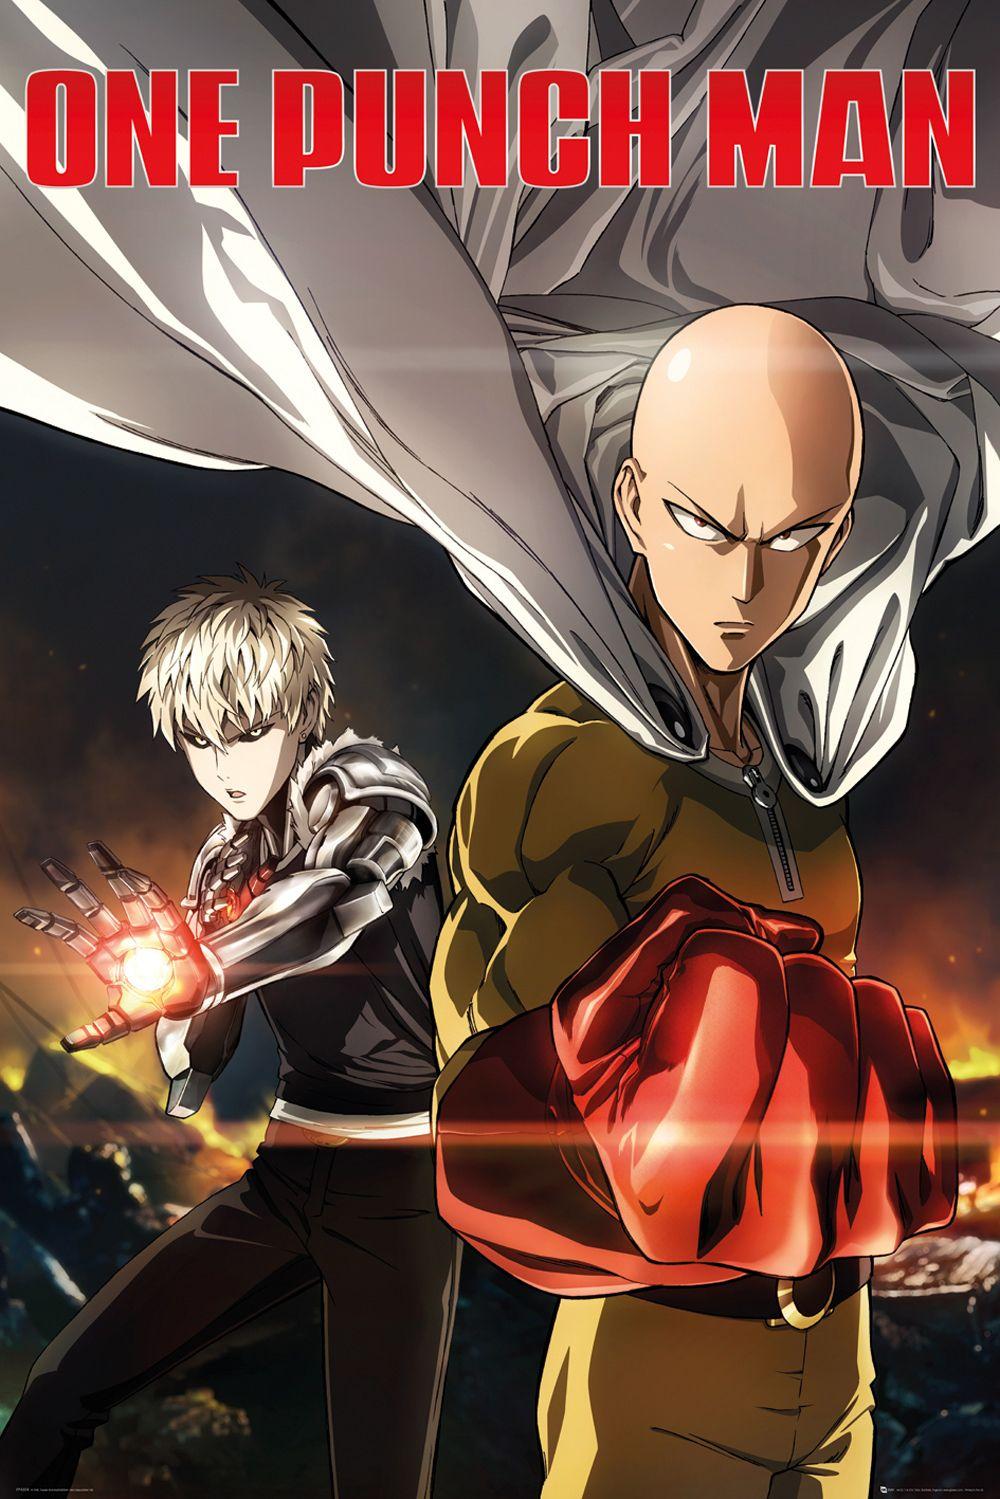 One Punch Man Poster Destruction Personagens De Anime Manga One Punch Man Anime One Punch Man